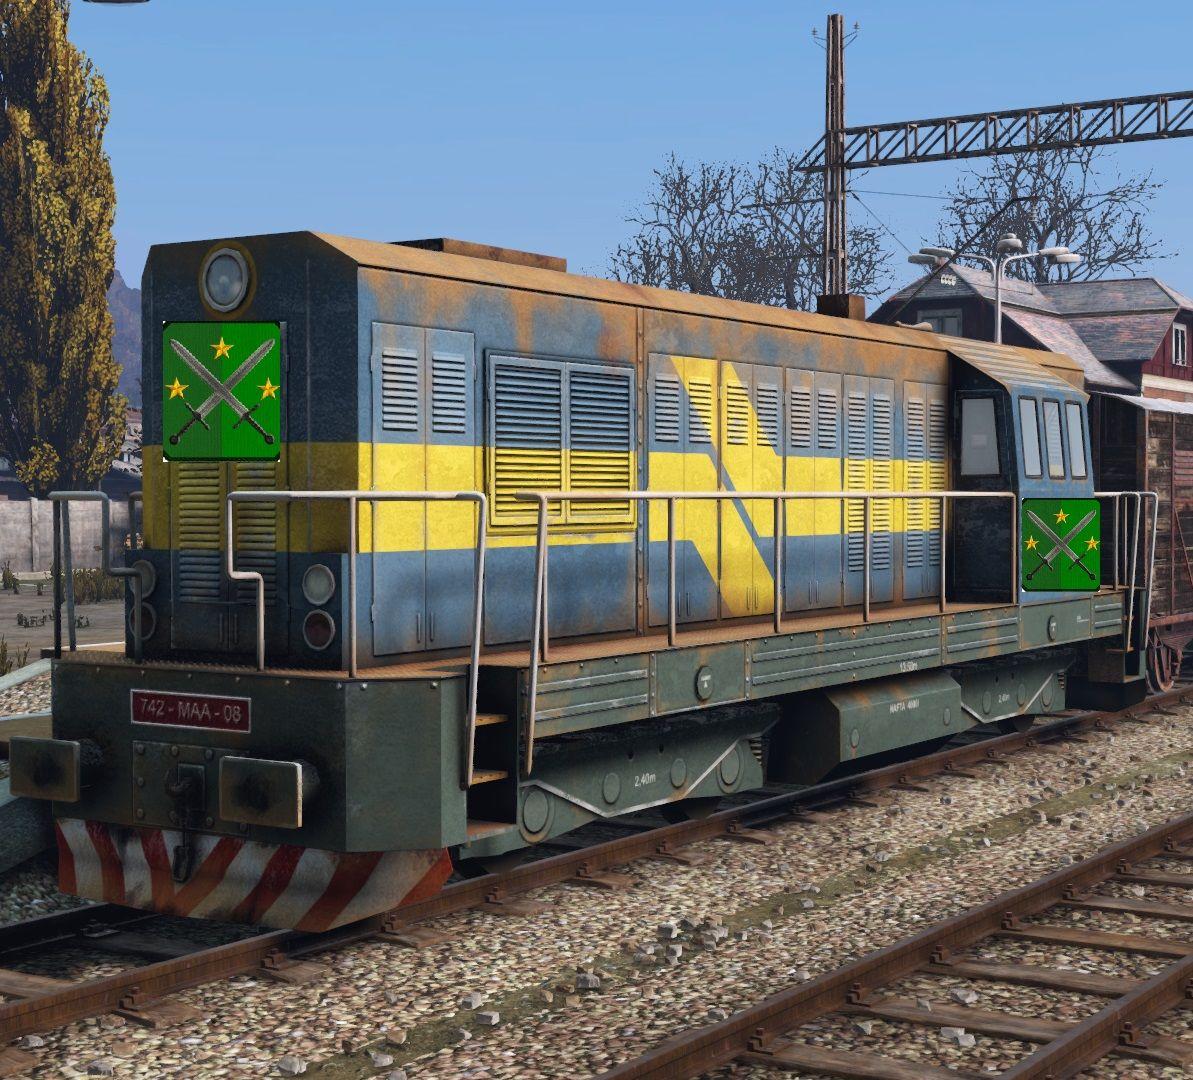 Land_Train_742_Blue.jpg.f6f7fb8997e2a02a2ee514fdea3e5d54.jpg